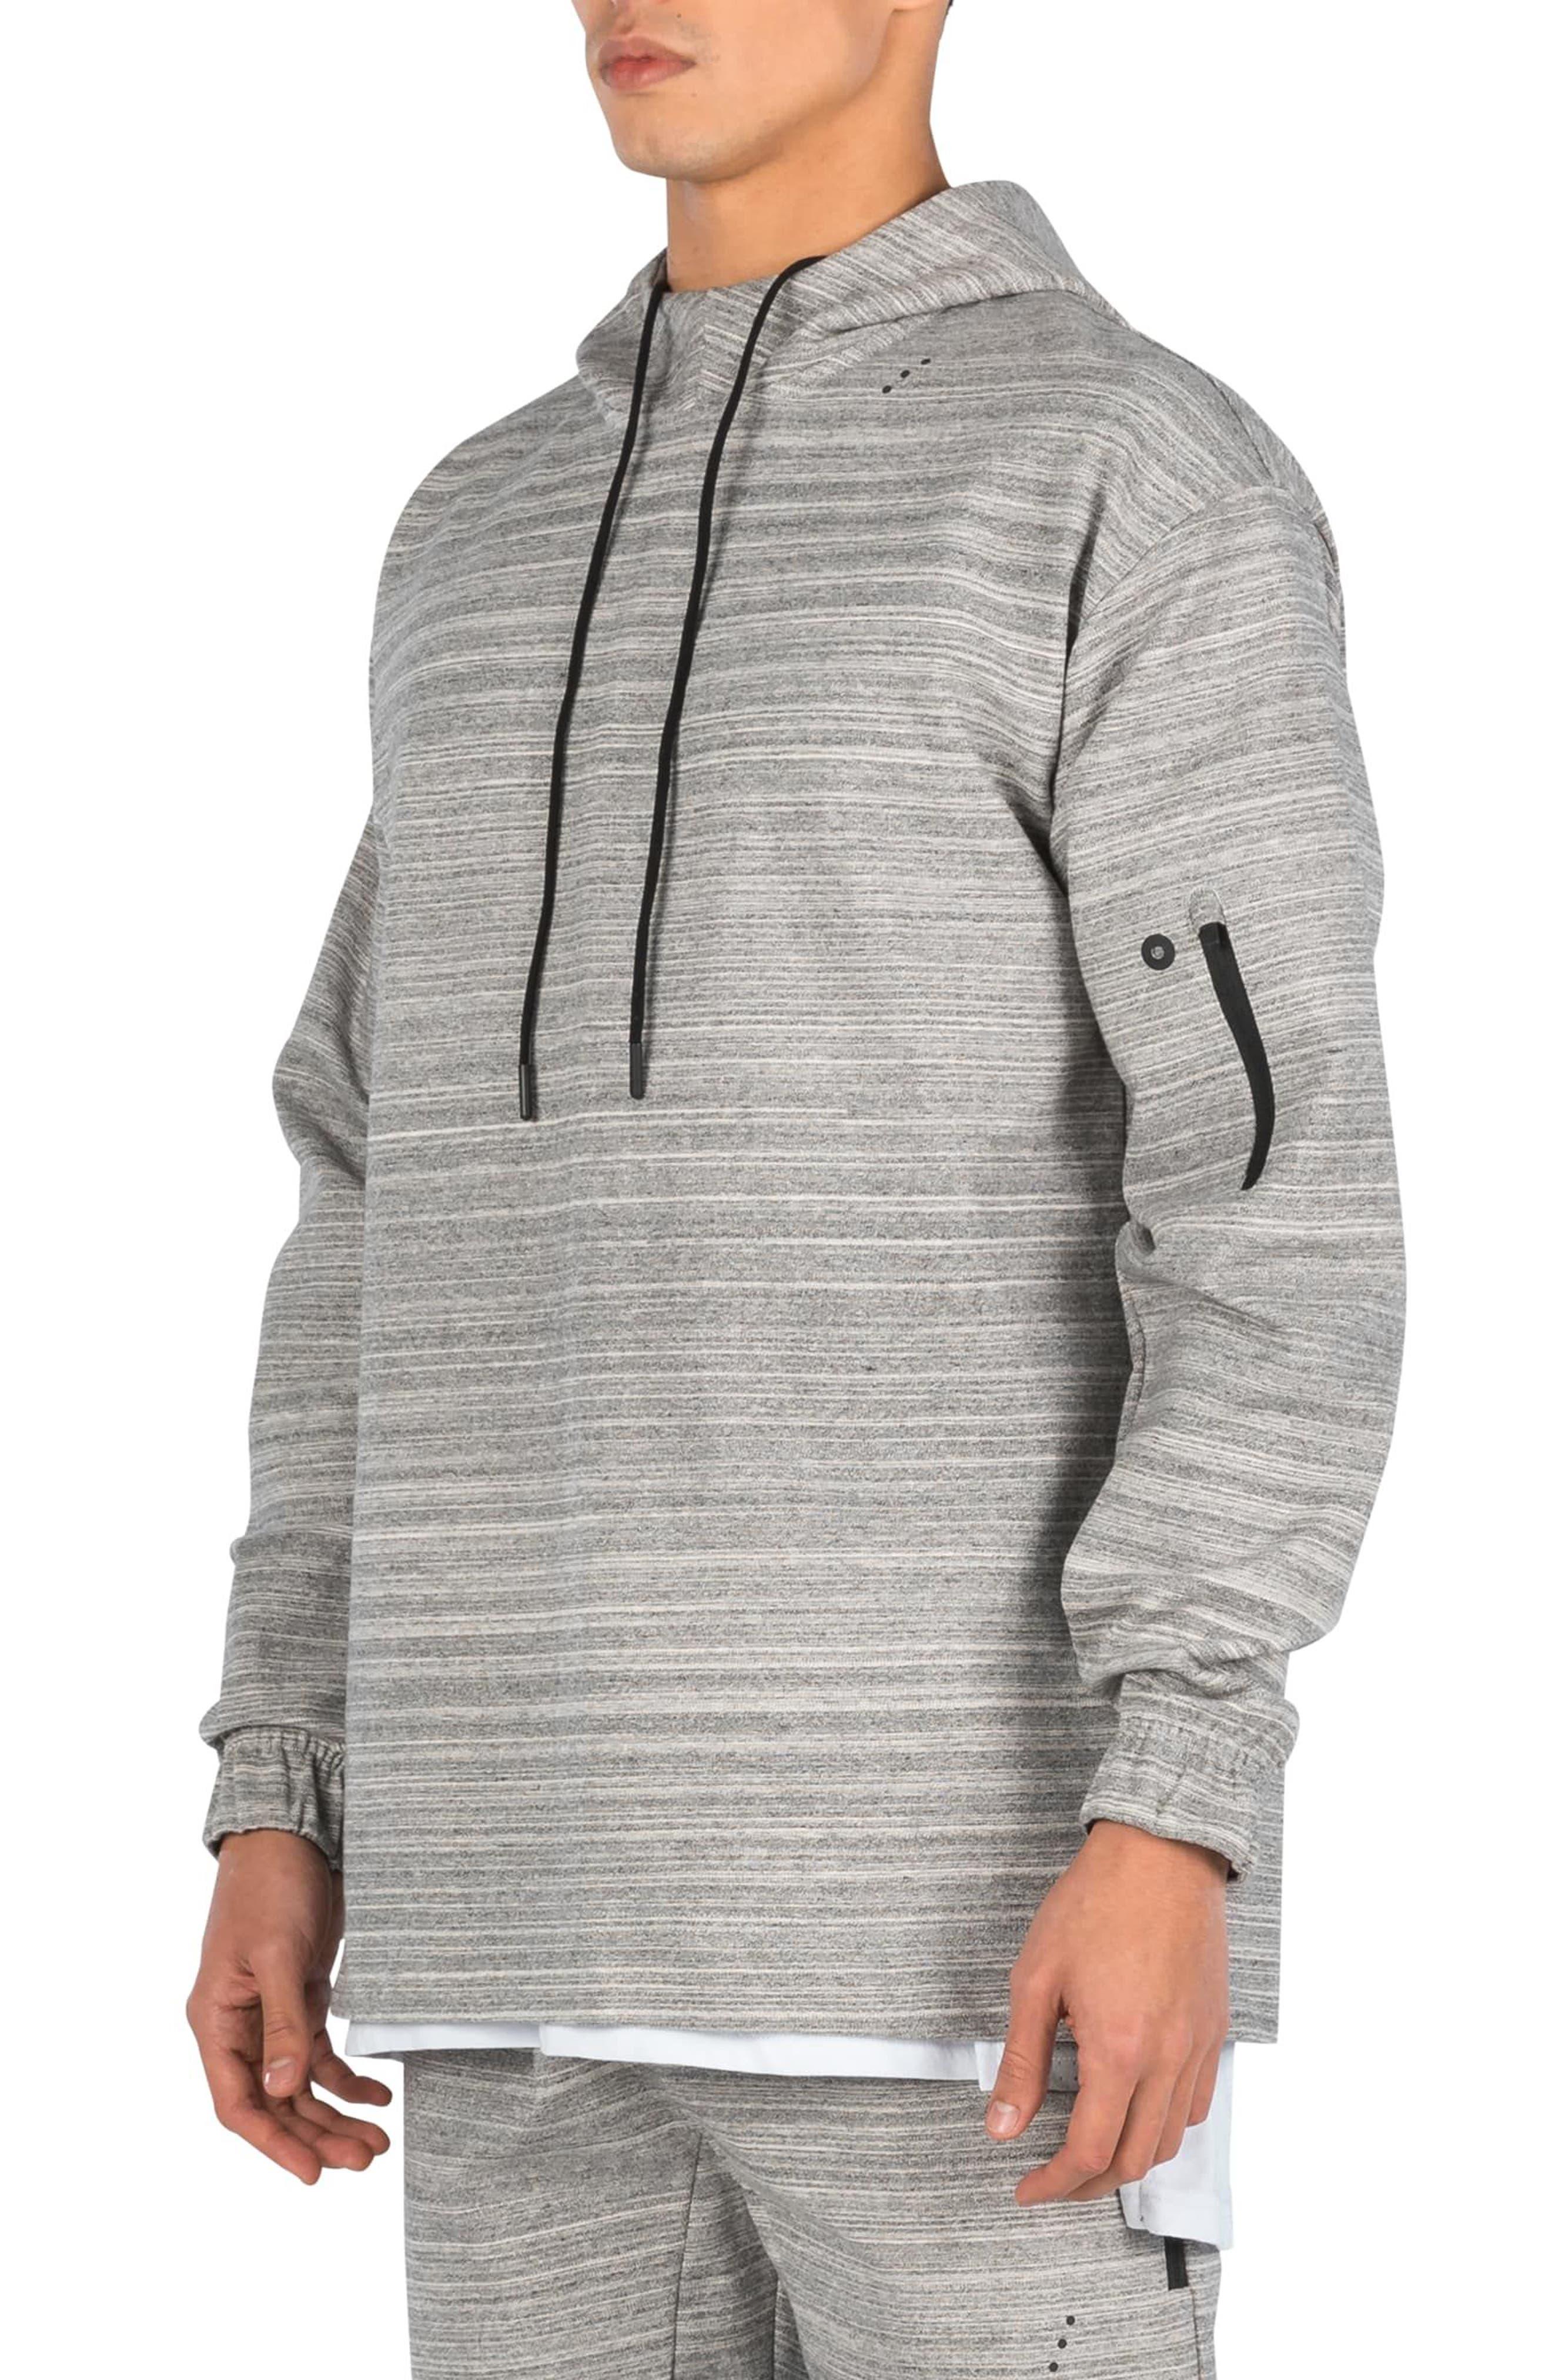 Tech Hoodie Sweatshirt,                             Alternate thumbnail 4, color,                             031